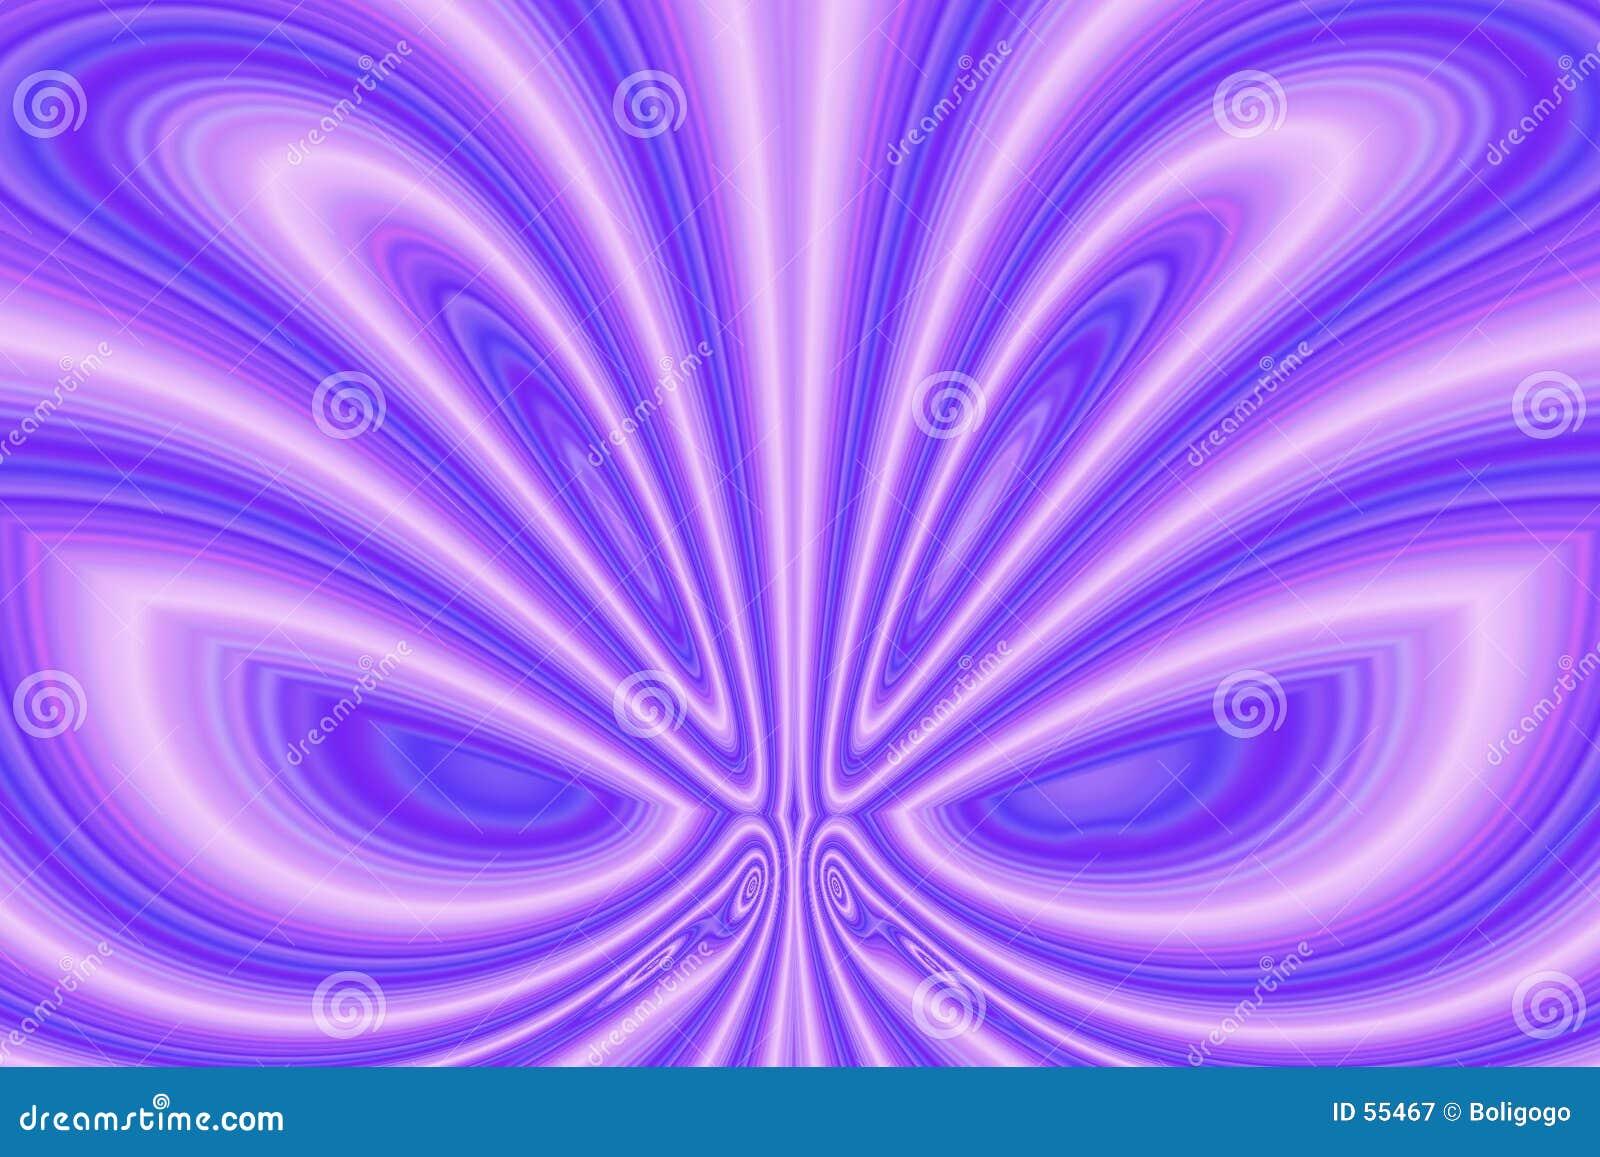 Mariposa líquida